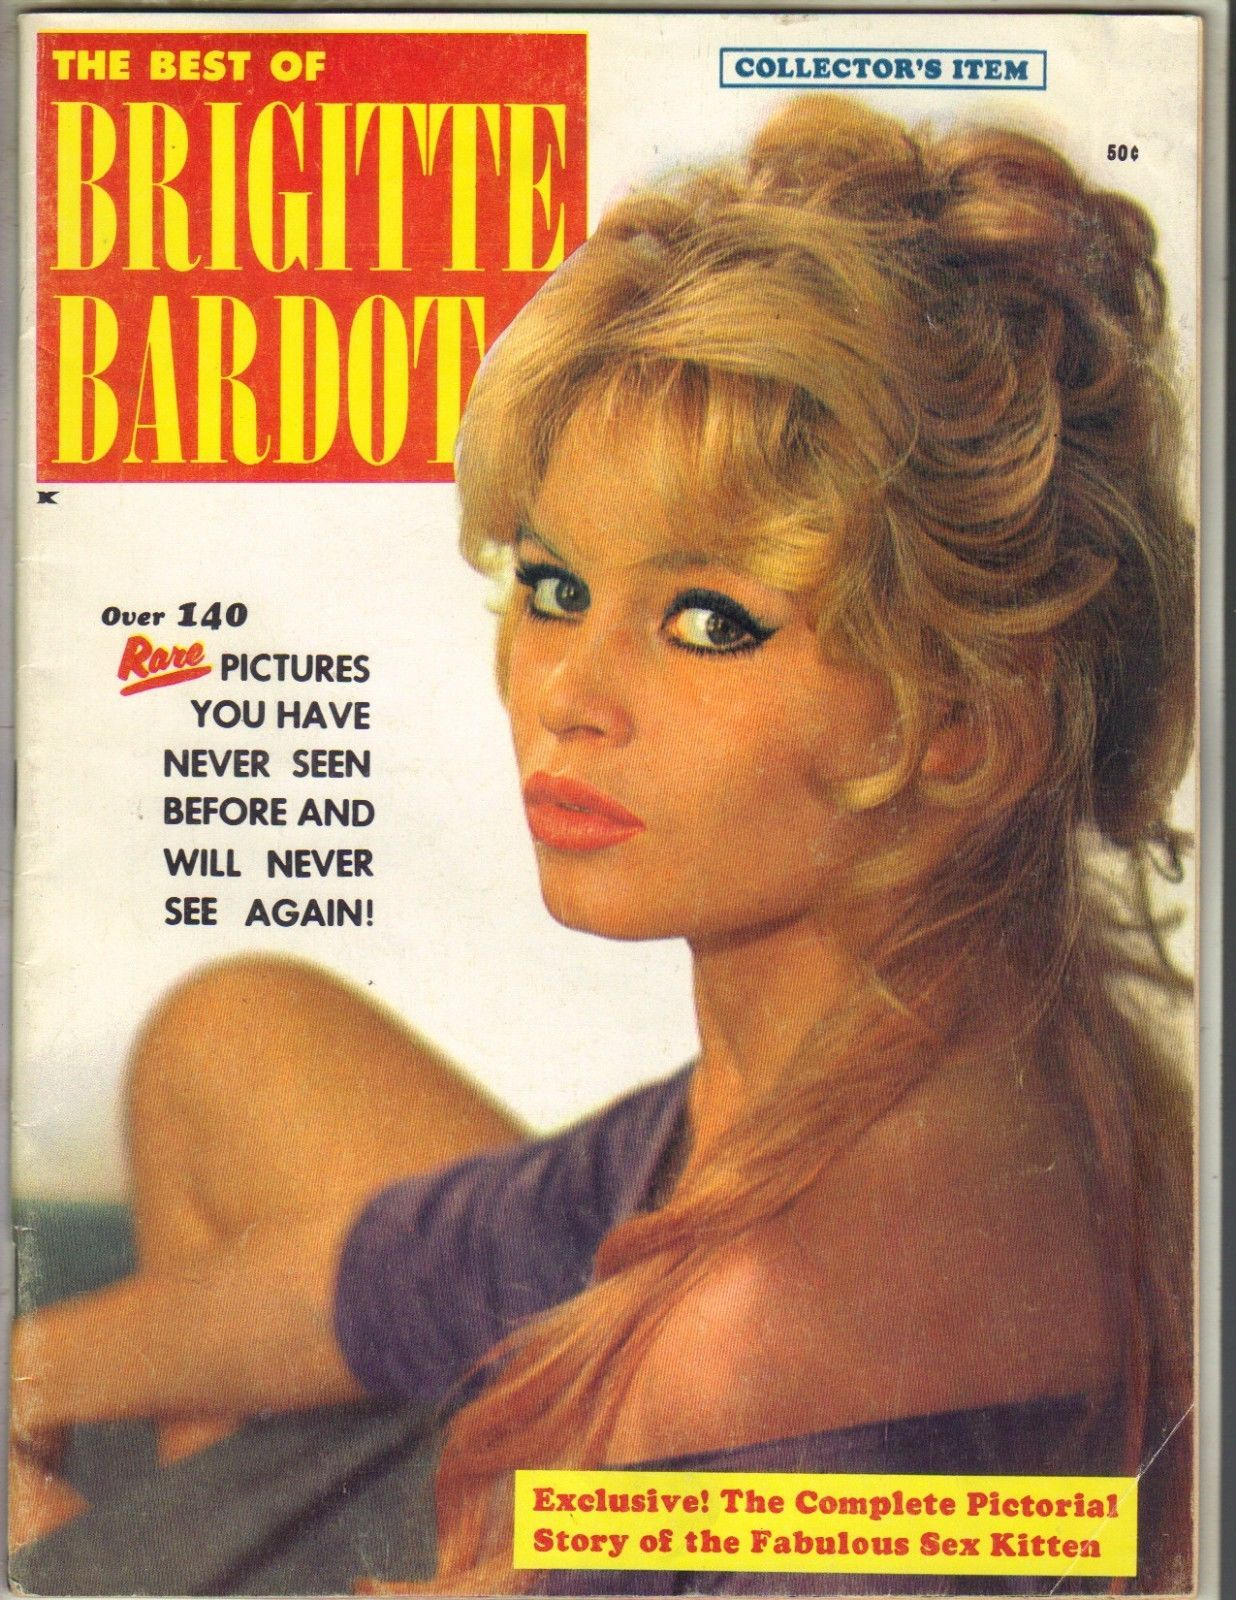 4f452fe8e2 THE BEST OF BRIGITTE BARDOT Magazine 1959 COLLECTOR'S ITEM 140 RARE  PICTURES   eBay